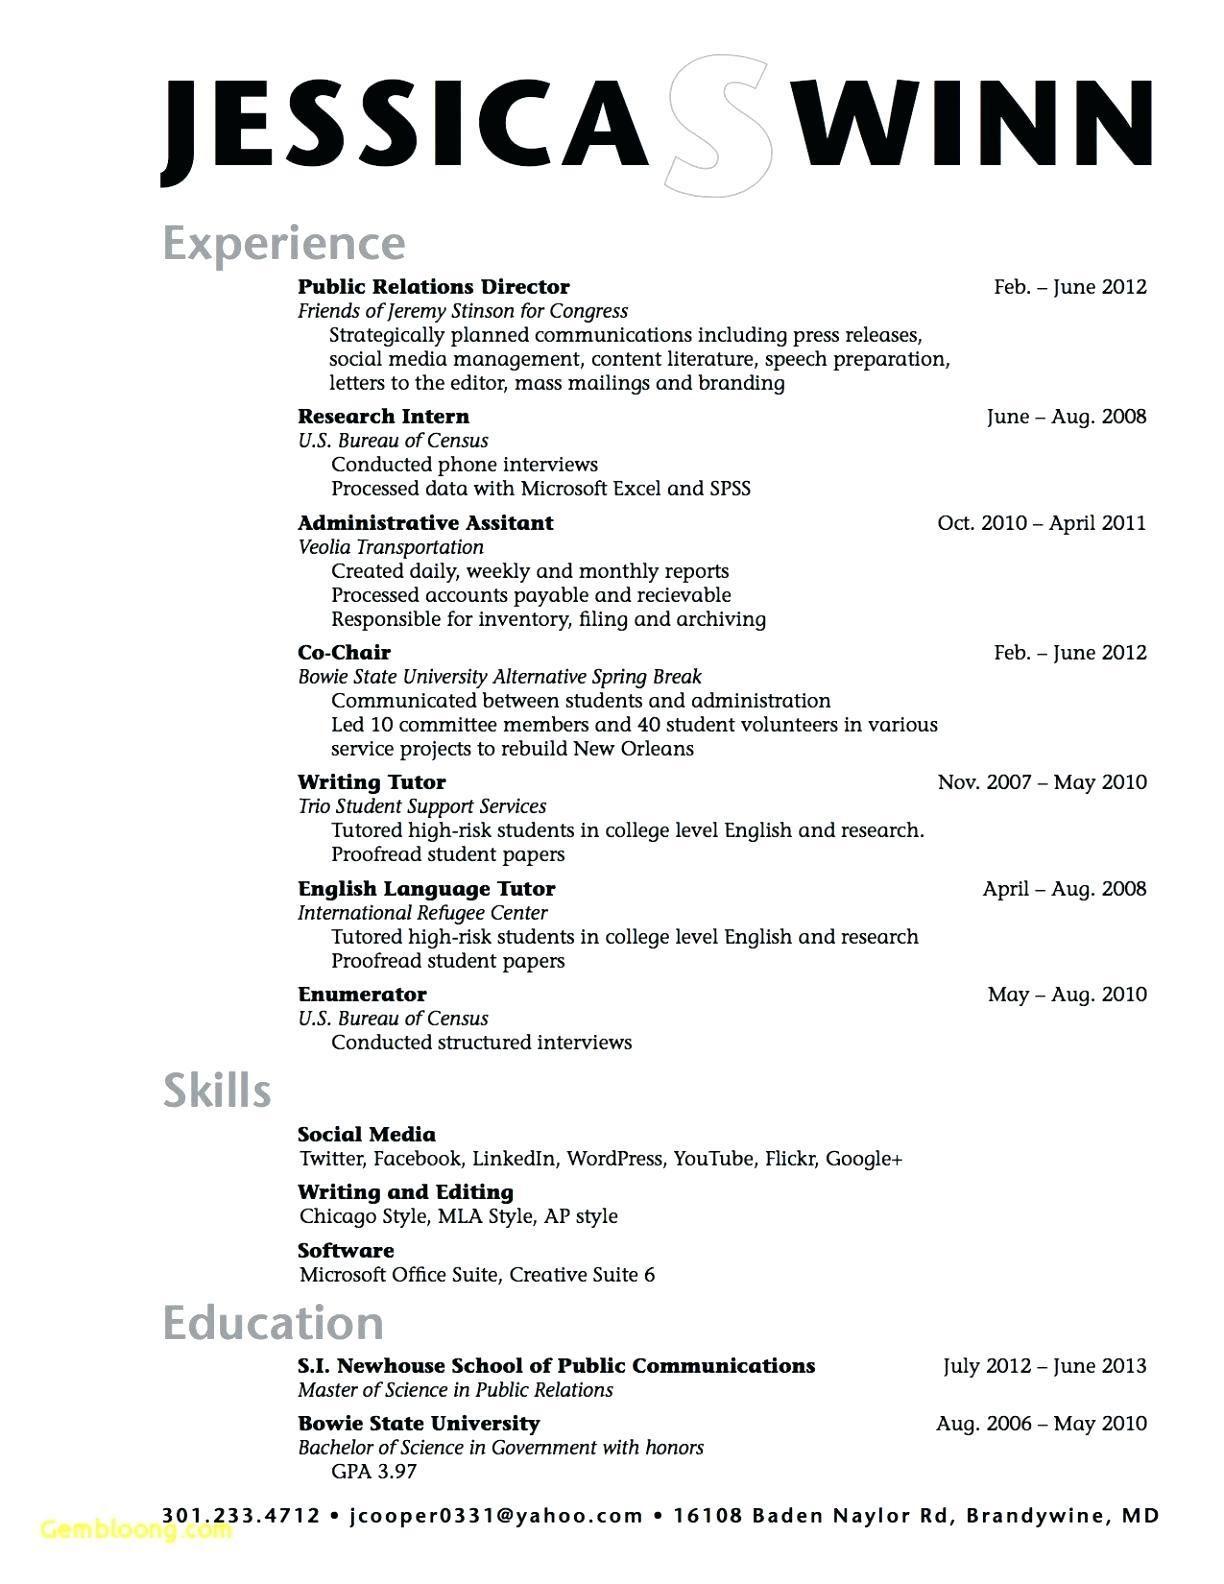 School Counselor Resume Sample School Counselor Resume Sample School Counselor Cv Samp High School Resume High School Resume Template College Resume Template